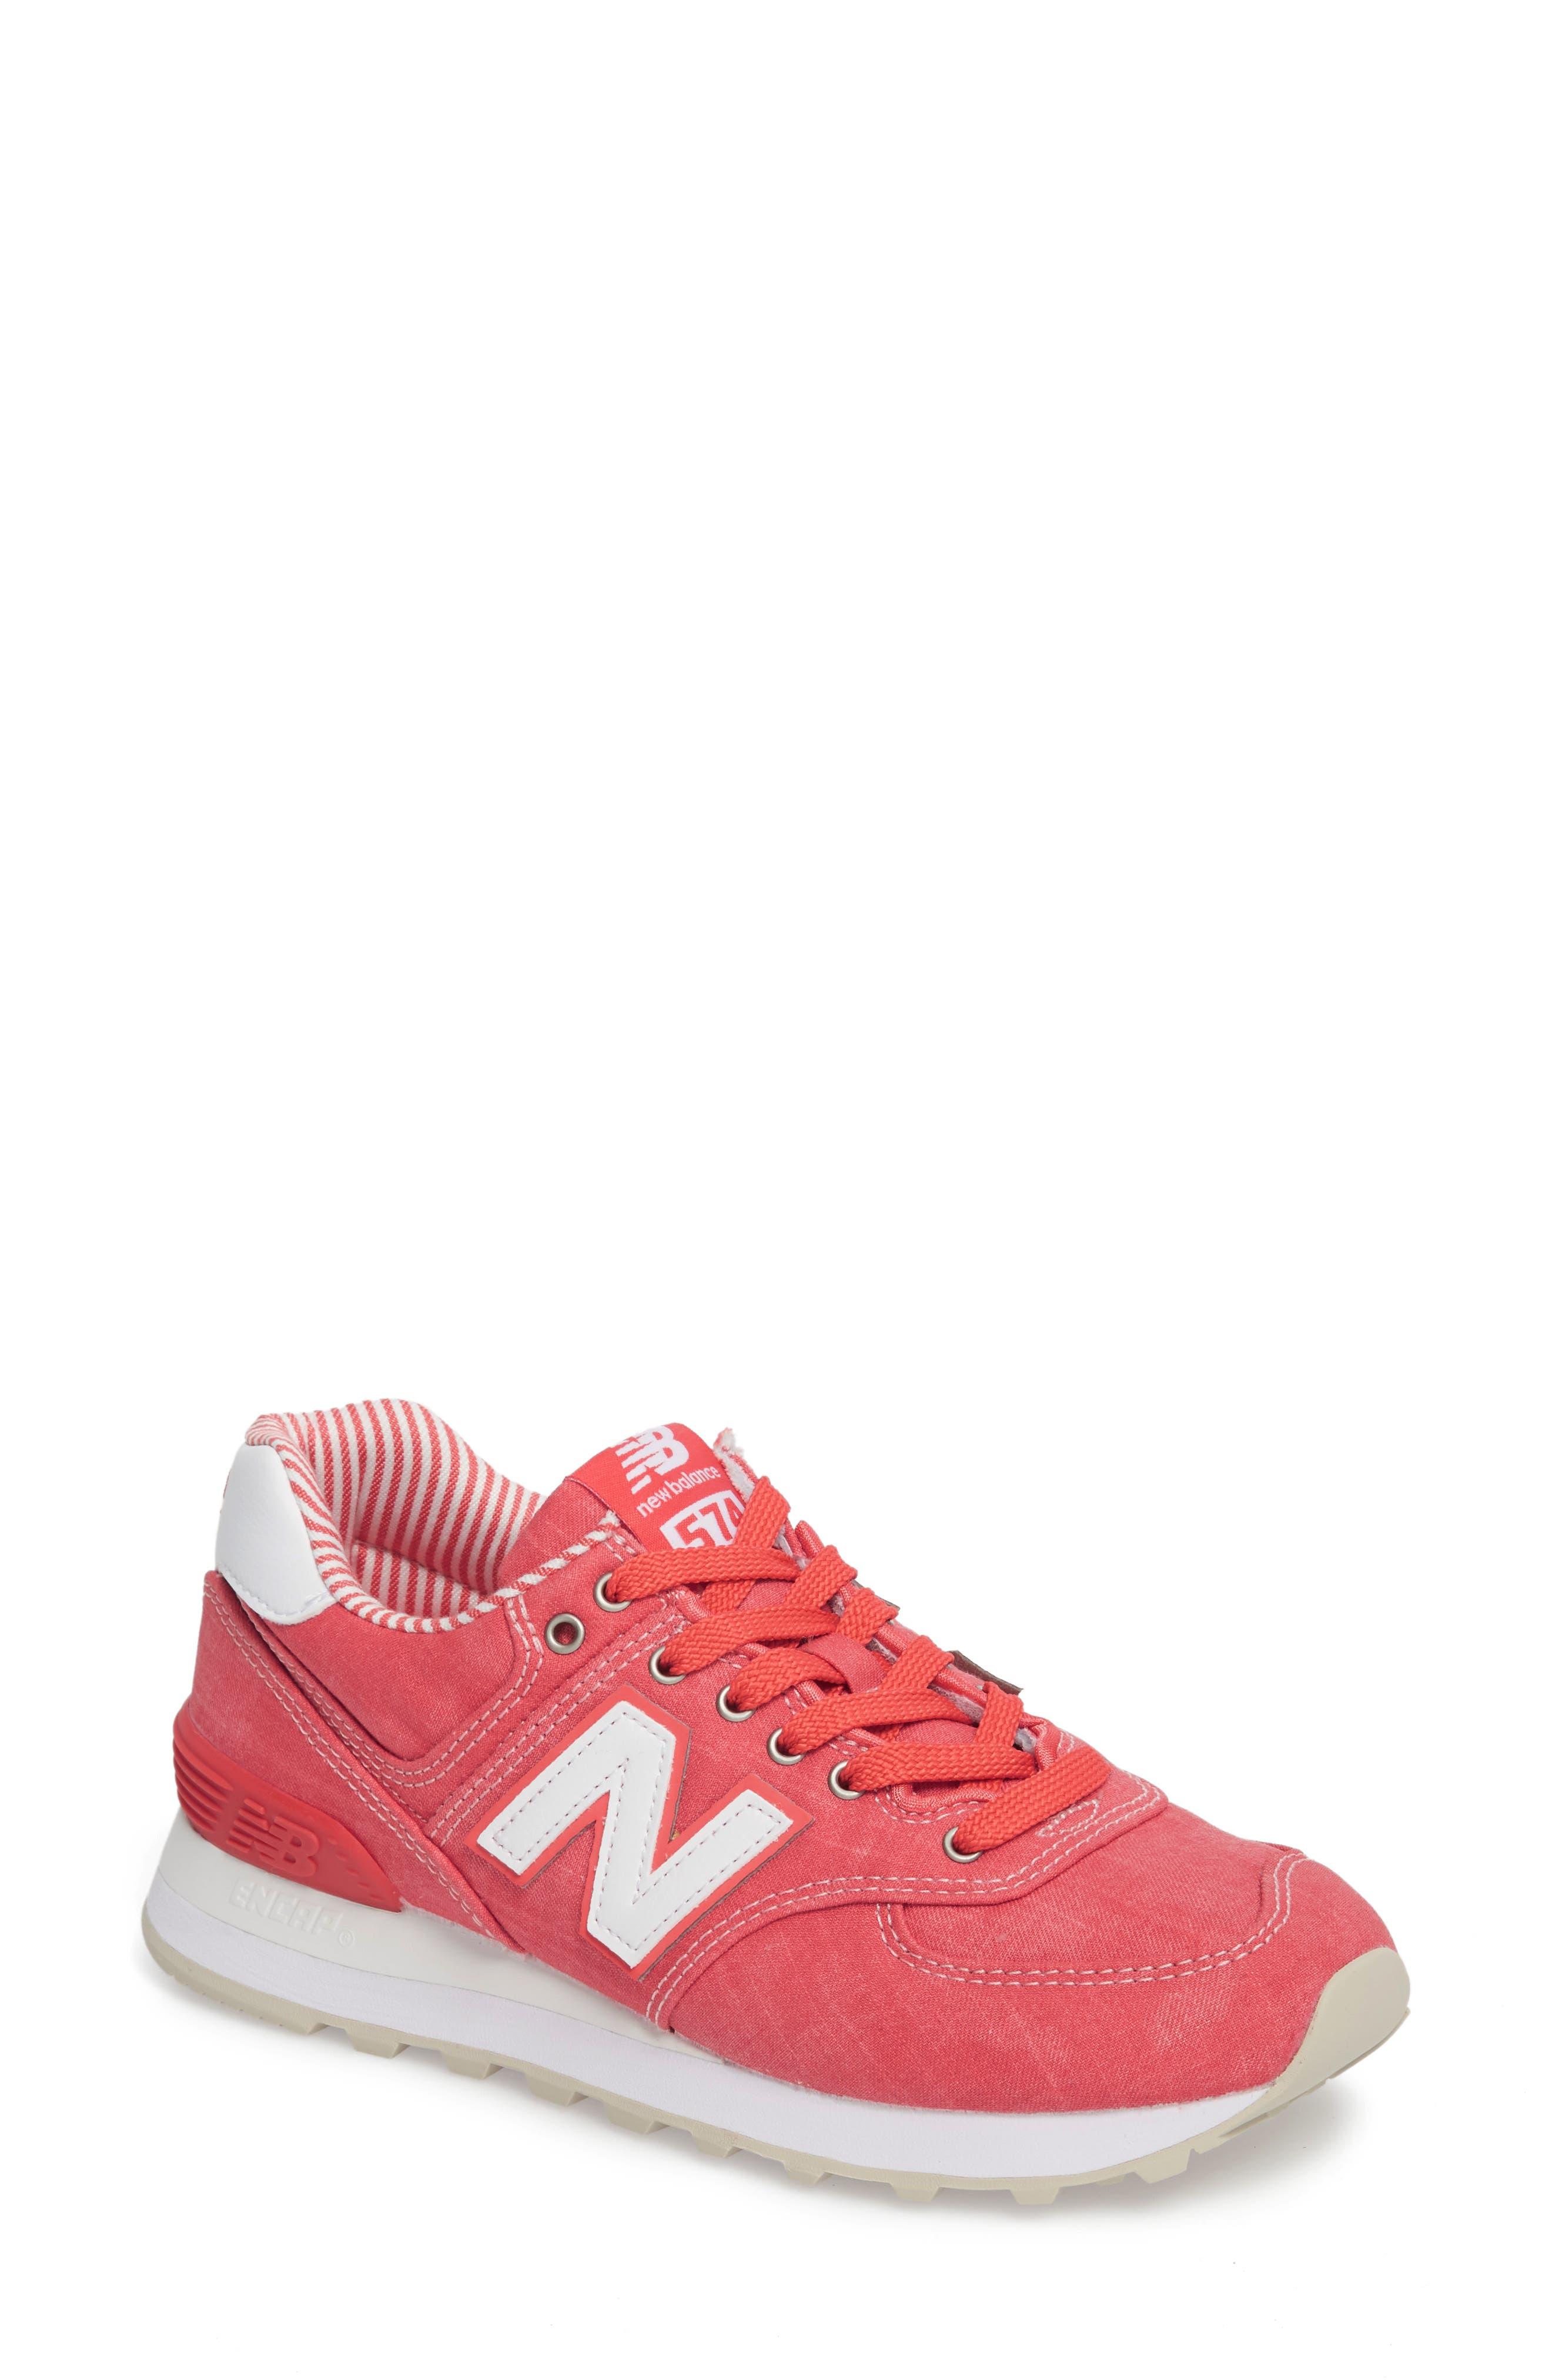 574 Sneaker,                             Main thumbnail 7, color,